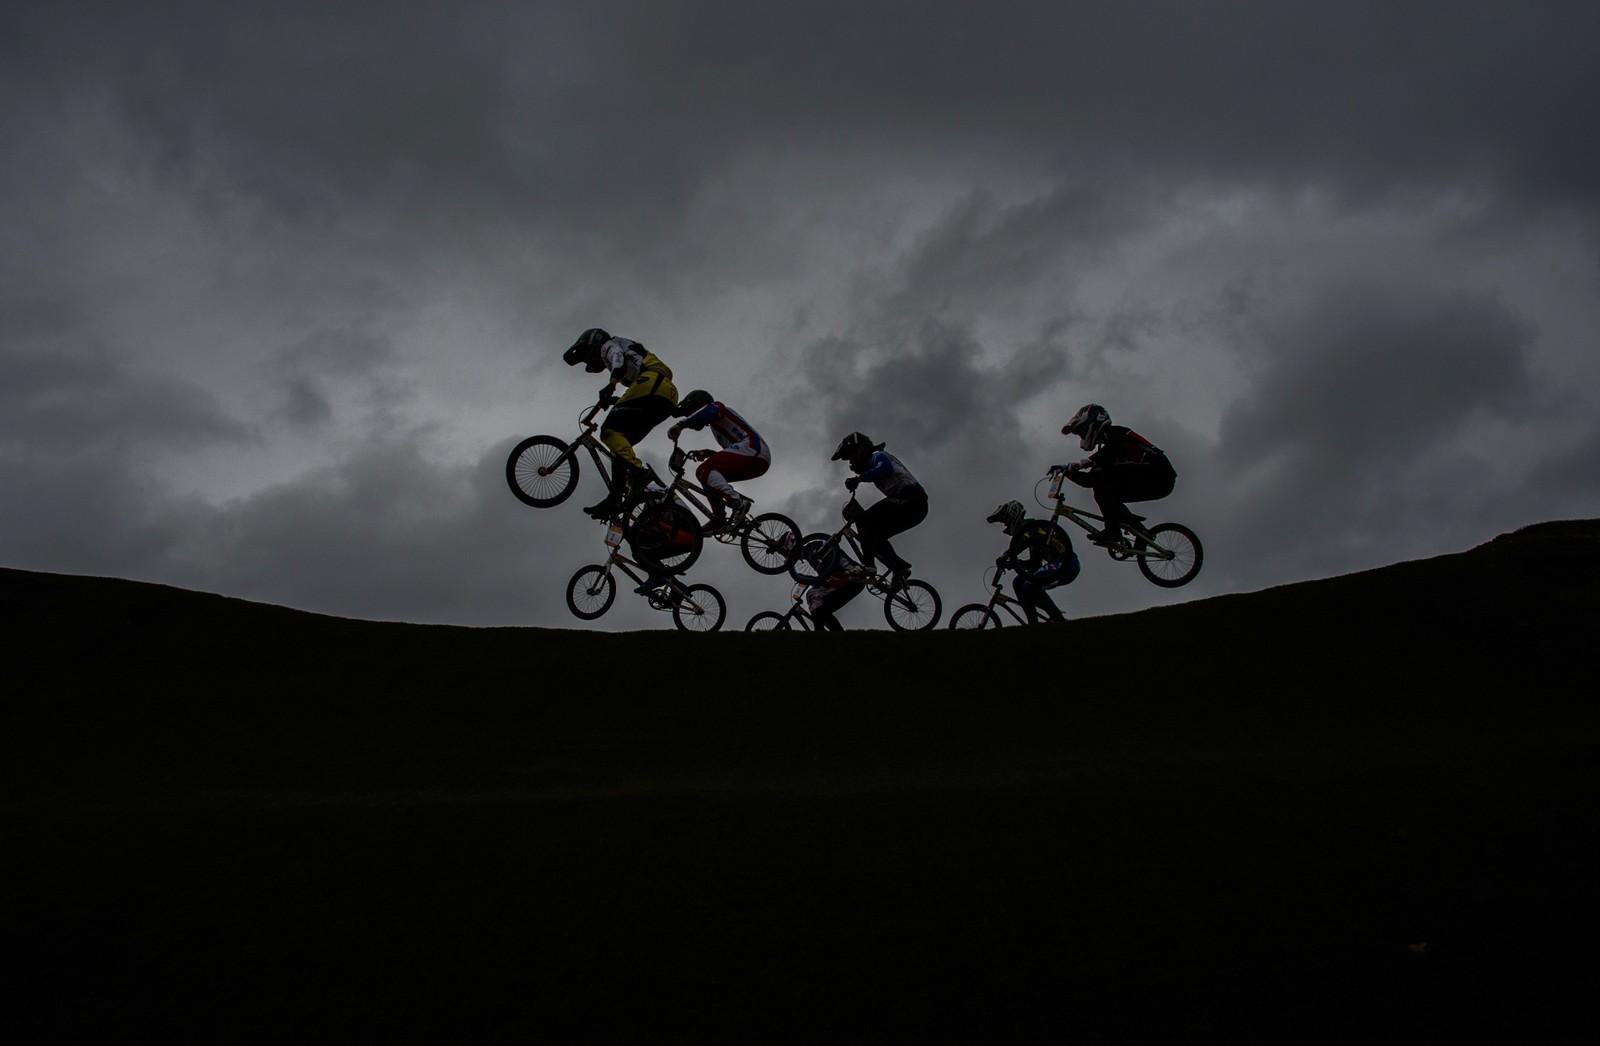 BMX-syklister tester løypa før OL i Rio 2016.